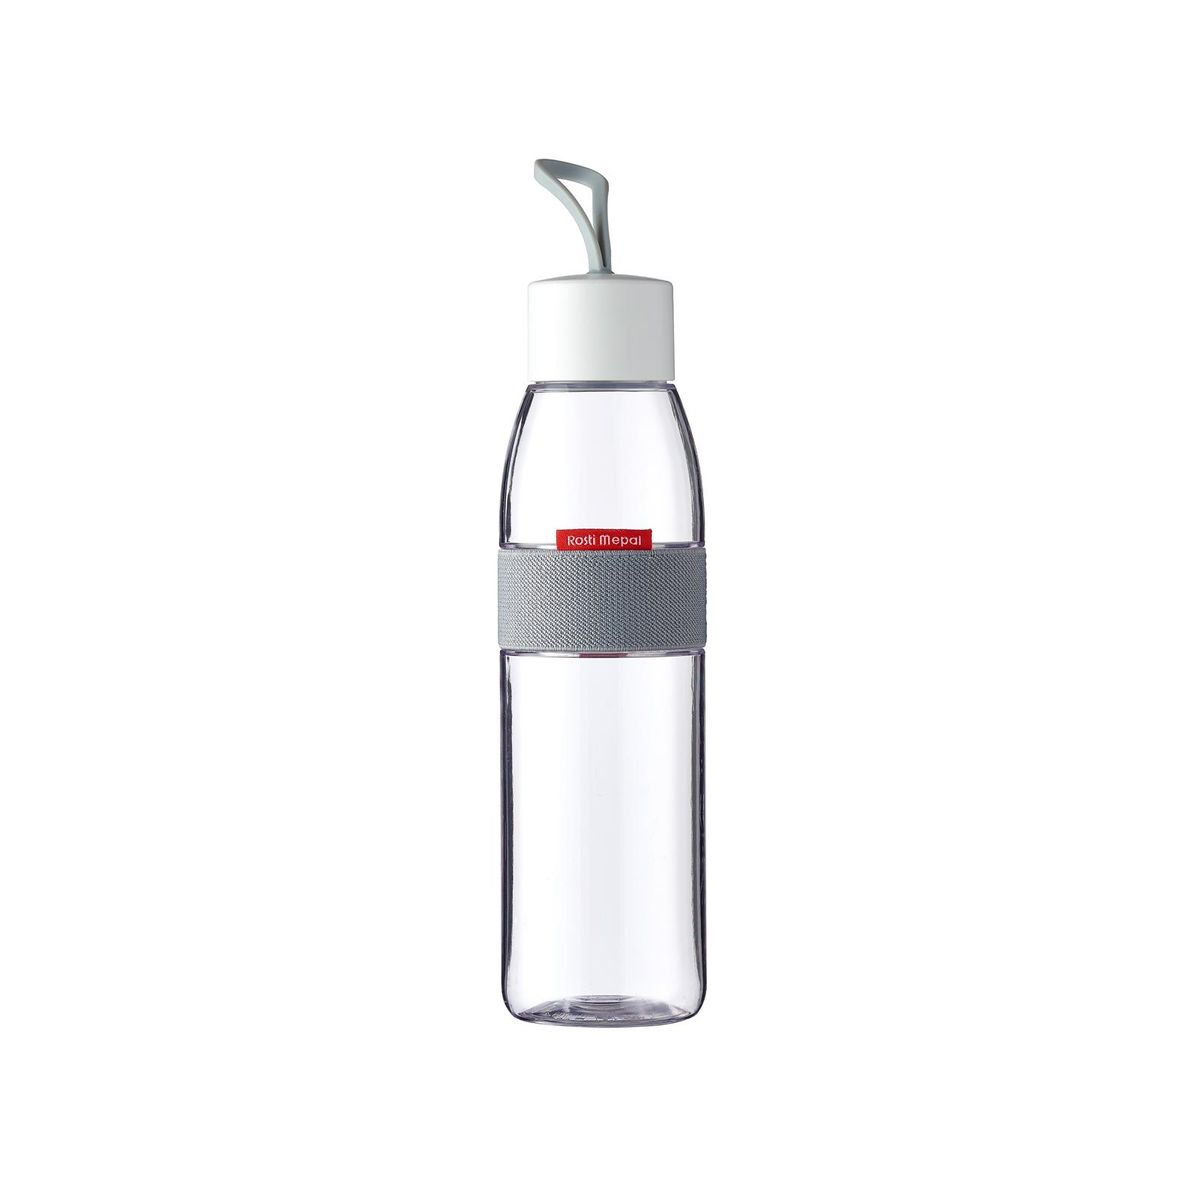 Bouteille nomade ellipse blanc 500 ml - Mepal